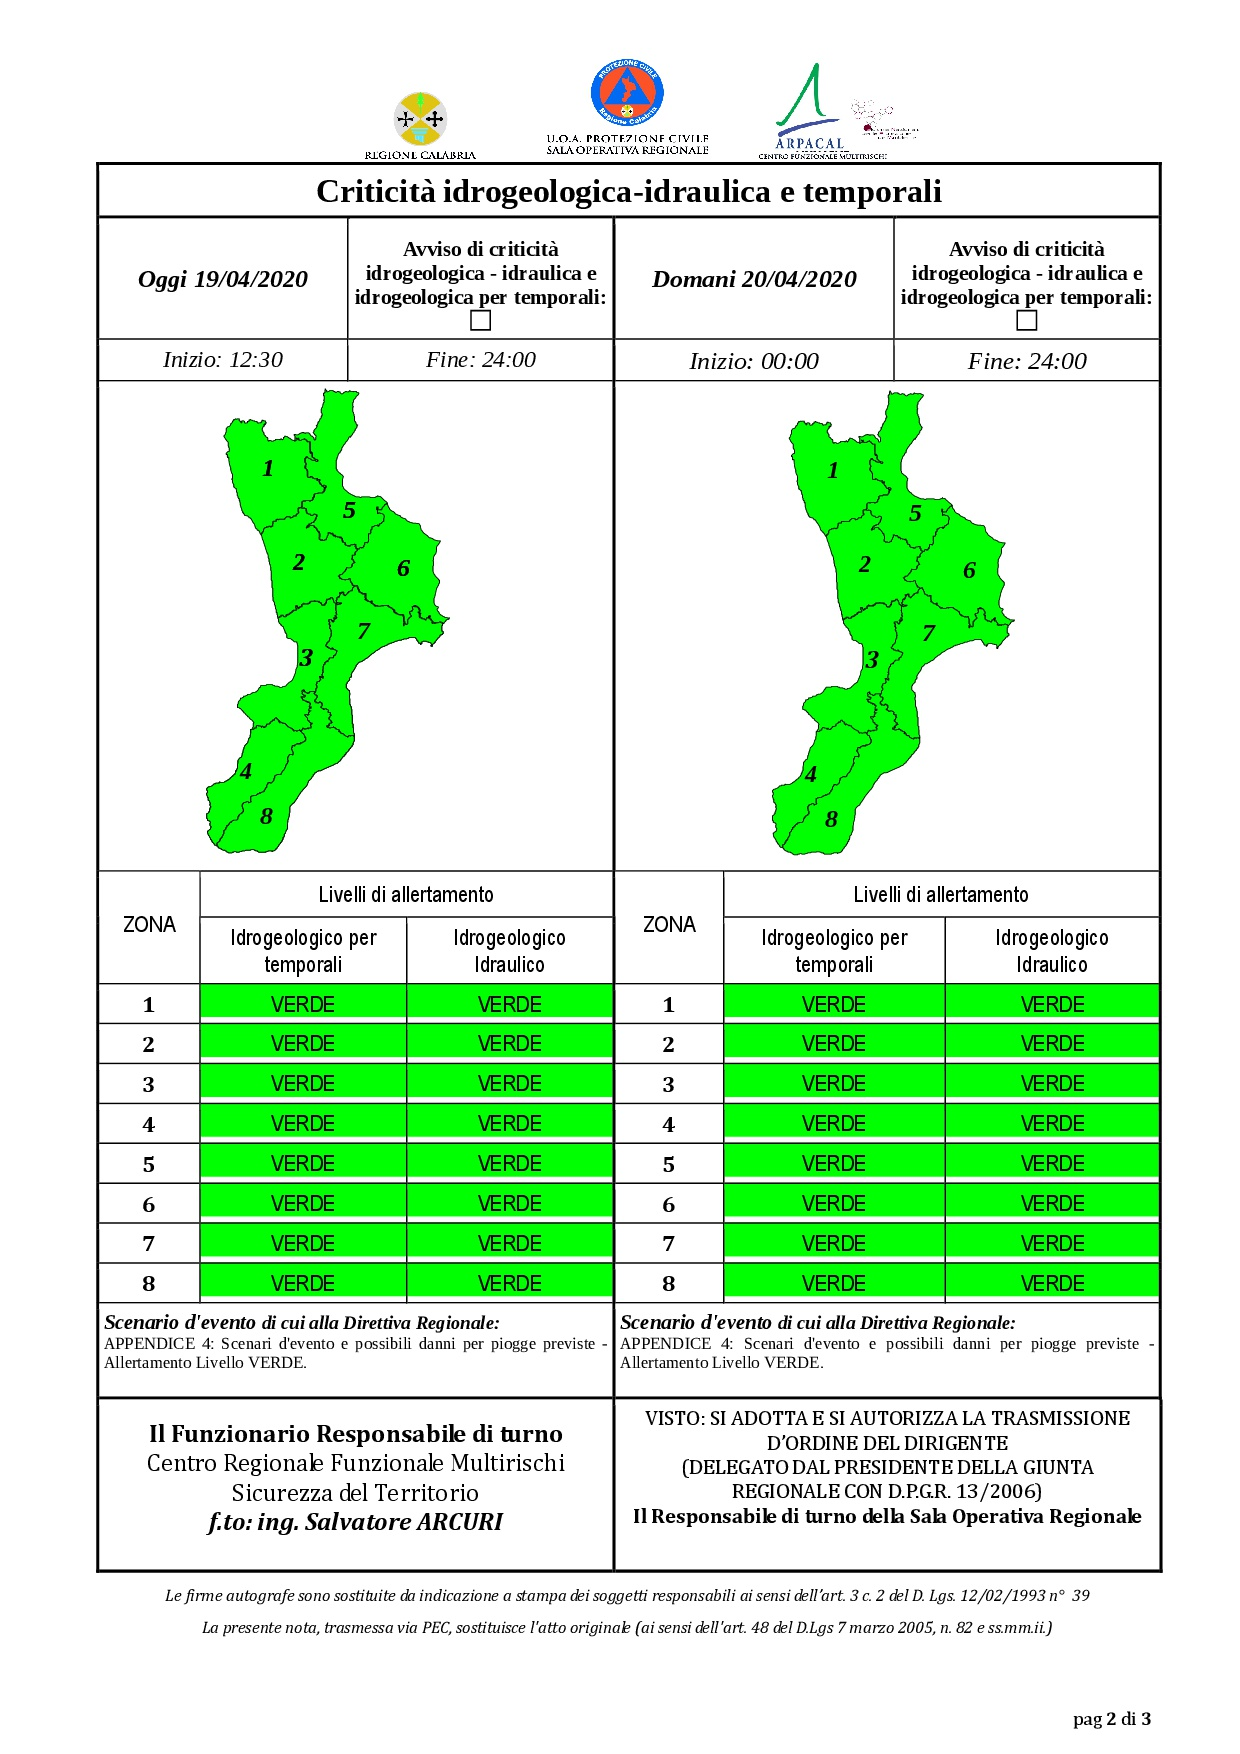 Criticità idrogeologica-idraulica e temporali in Calabria 19-04-2020